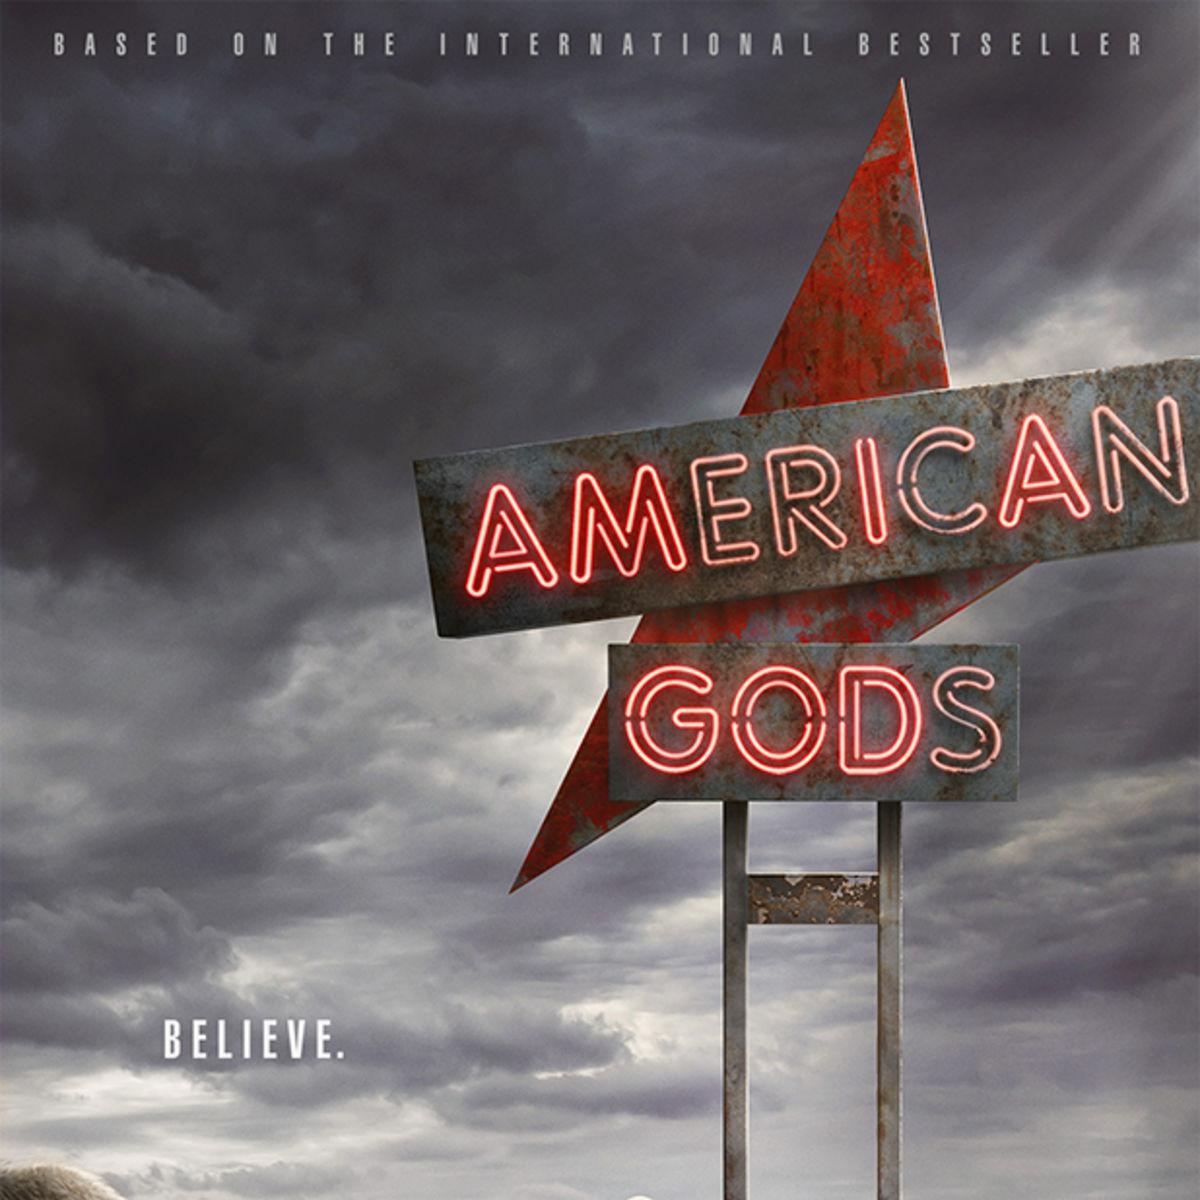 American Gods stars Yetide Badaki and Ricky Whittle on going deeper ...